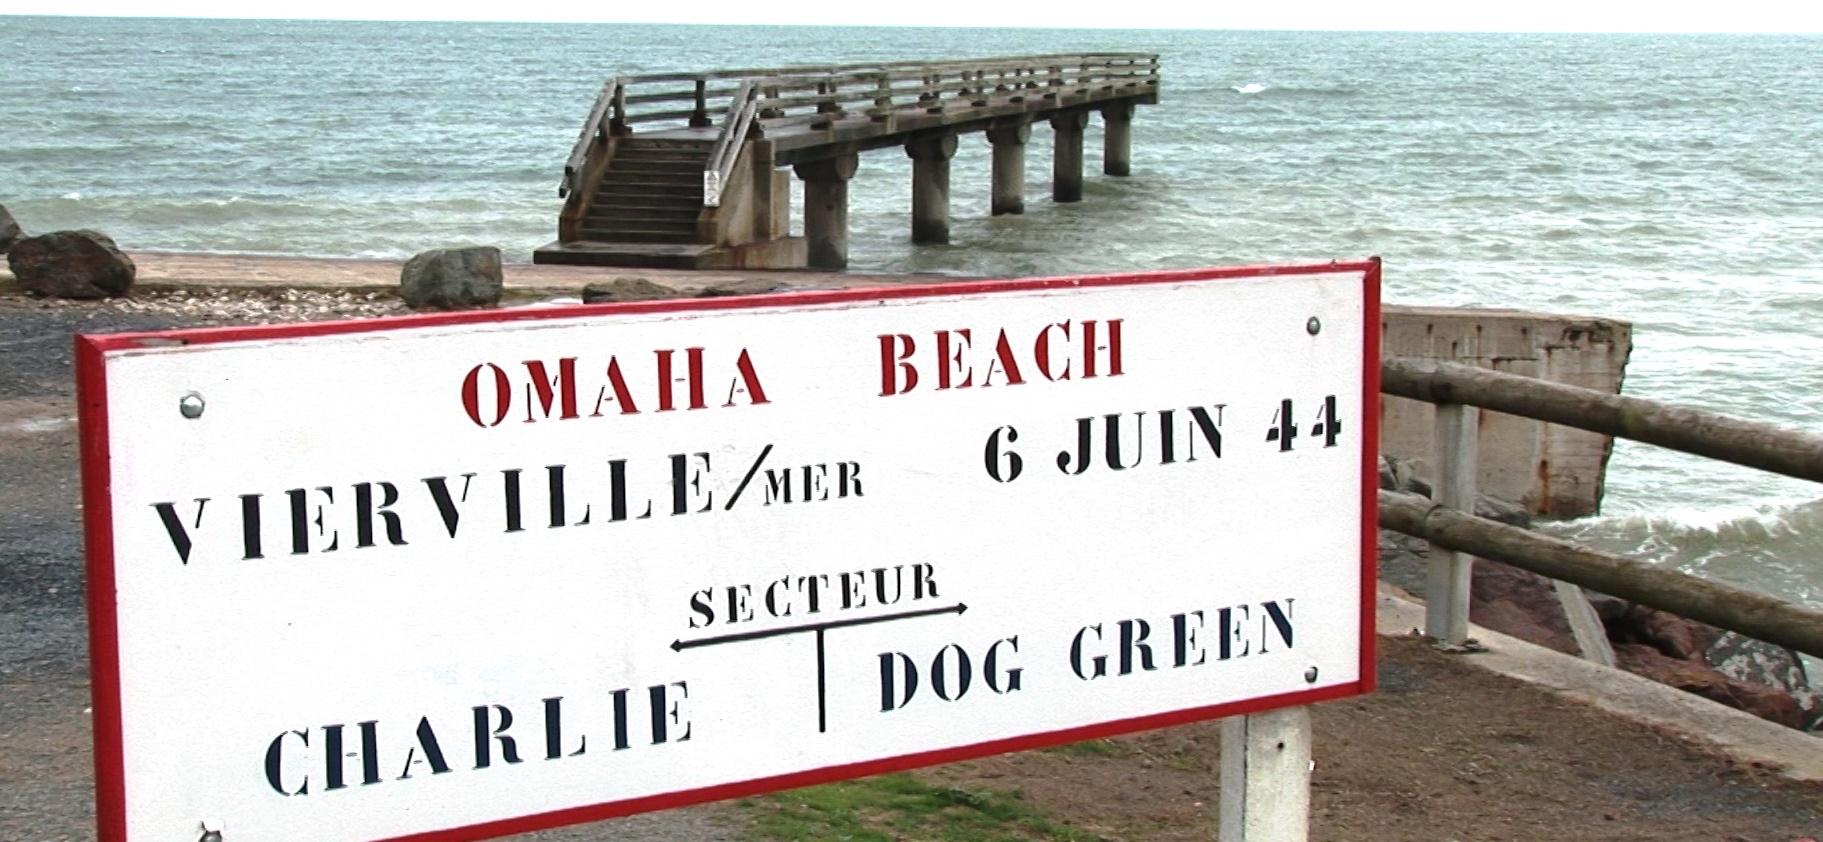 Omaha Beach, Dog Green sign